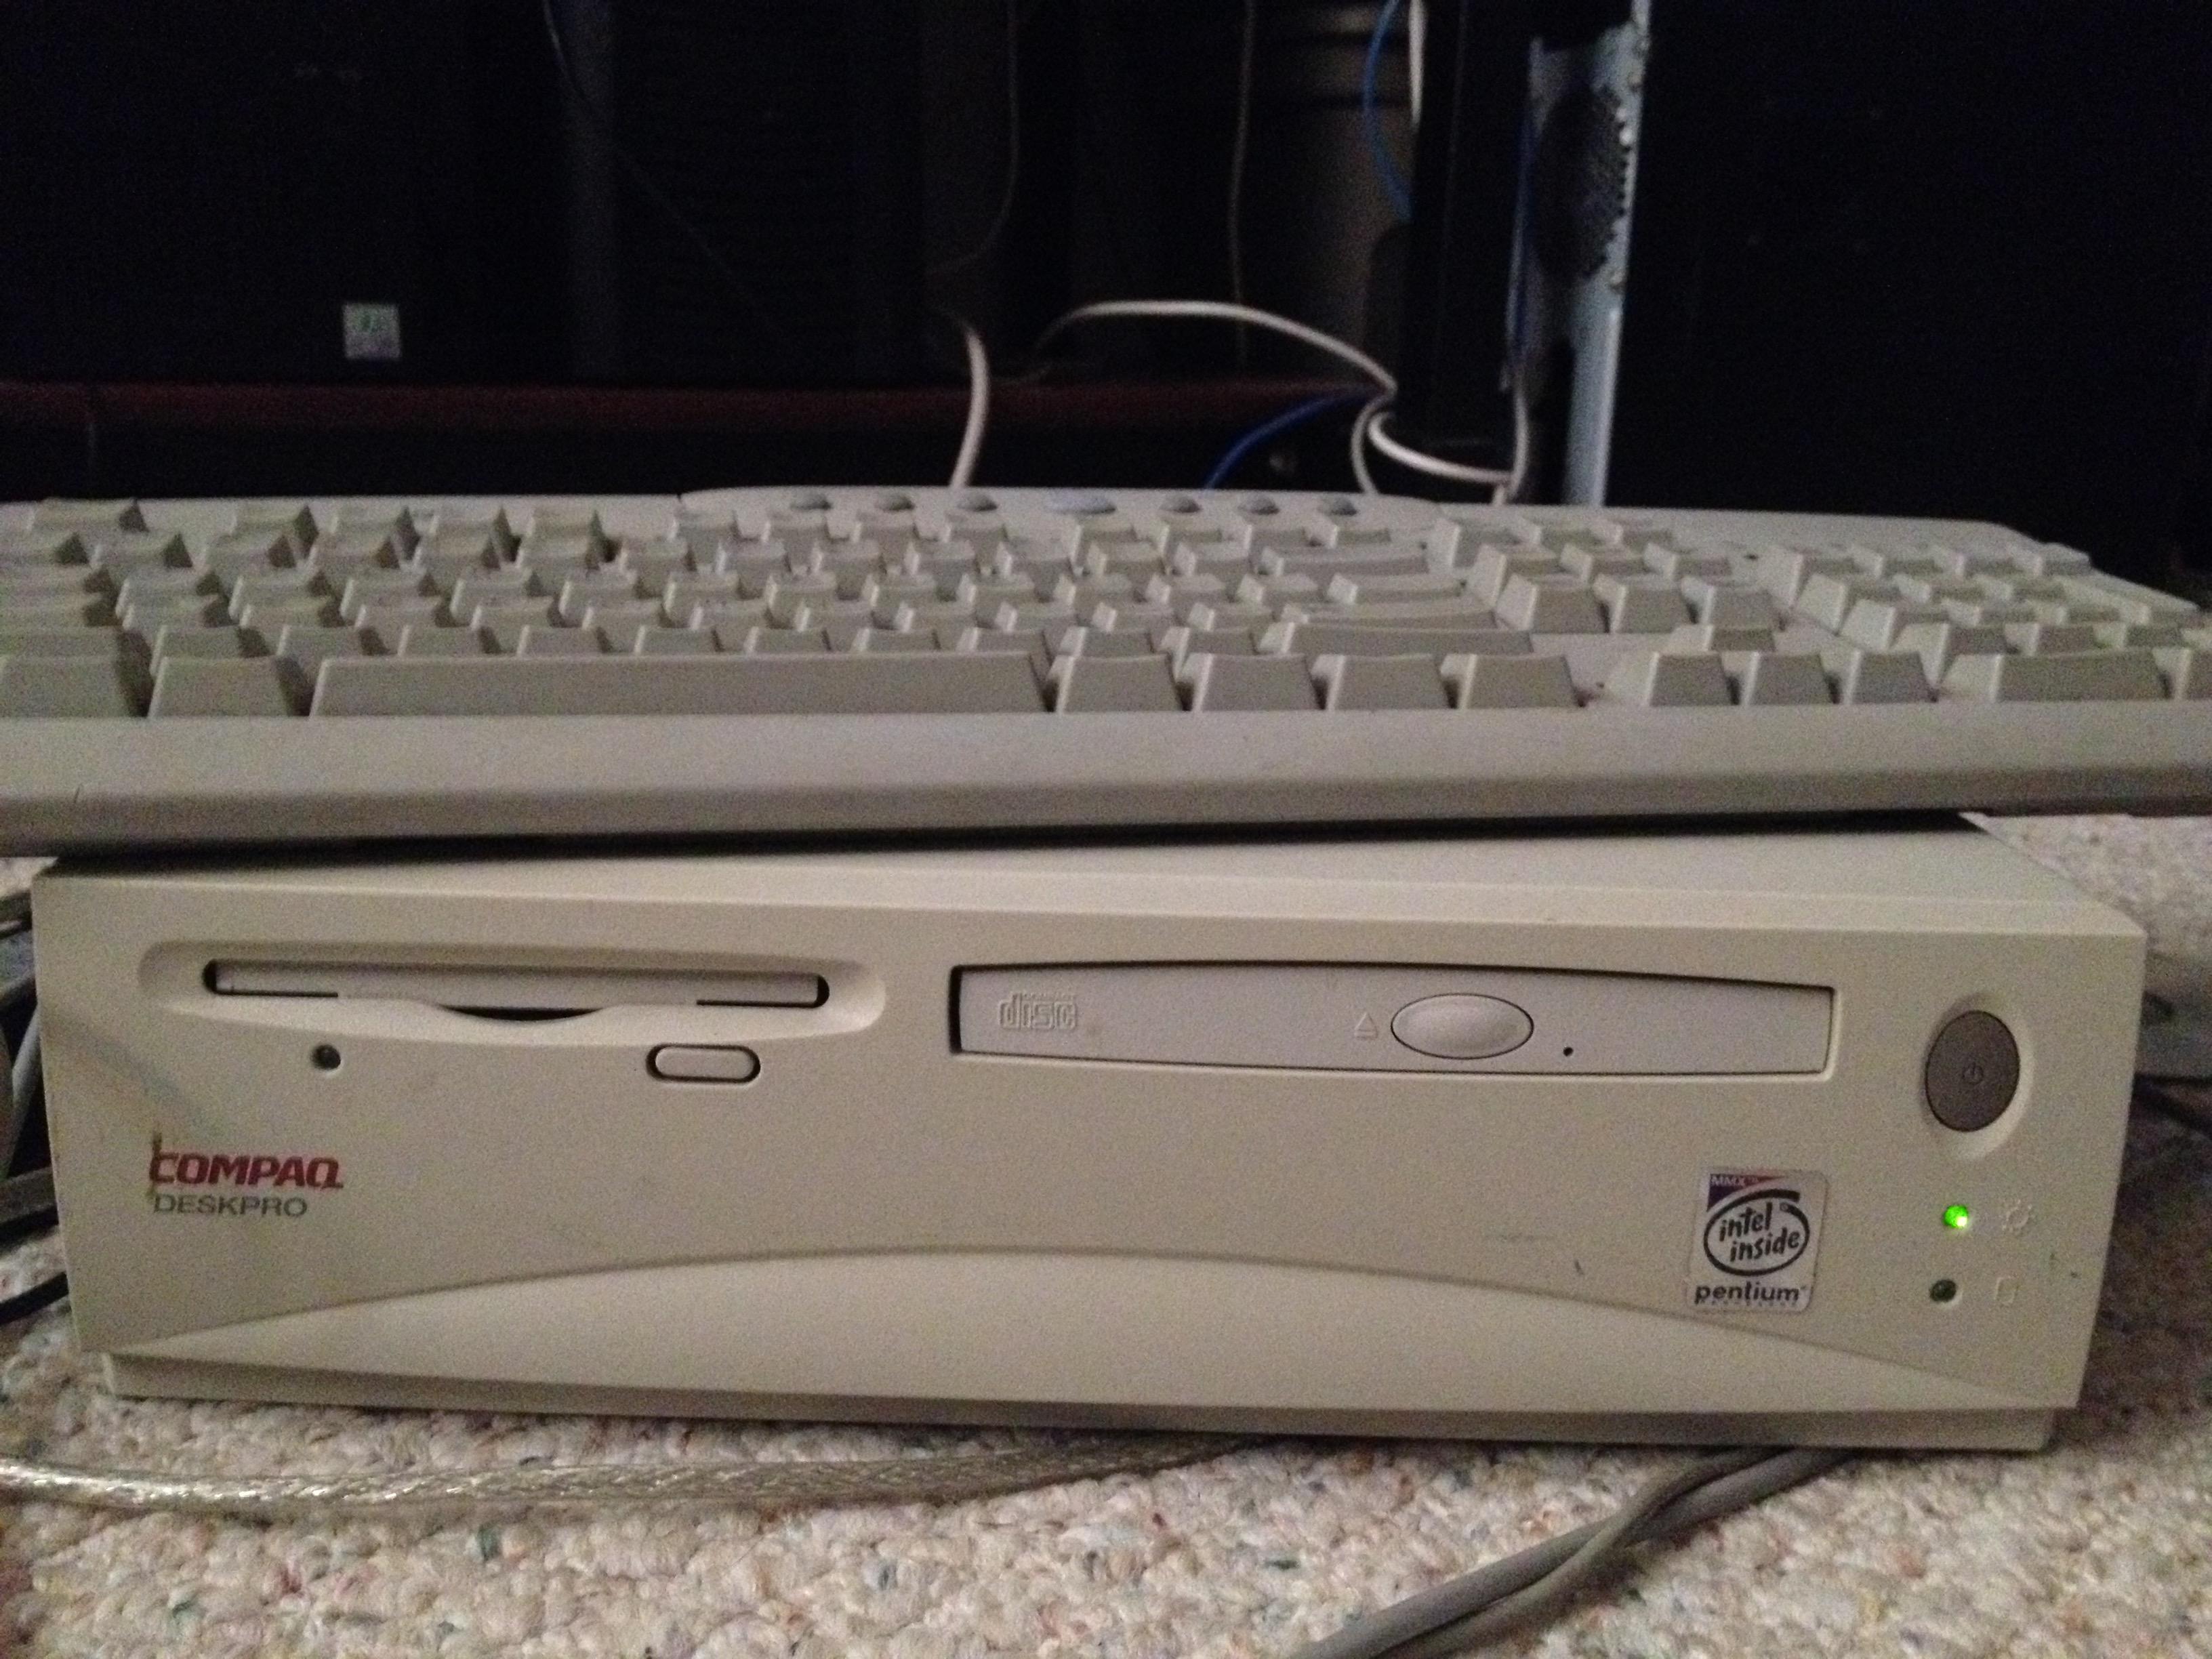 Compaq DeskPro EN 6333 SFF